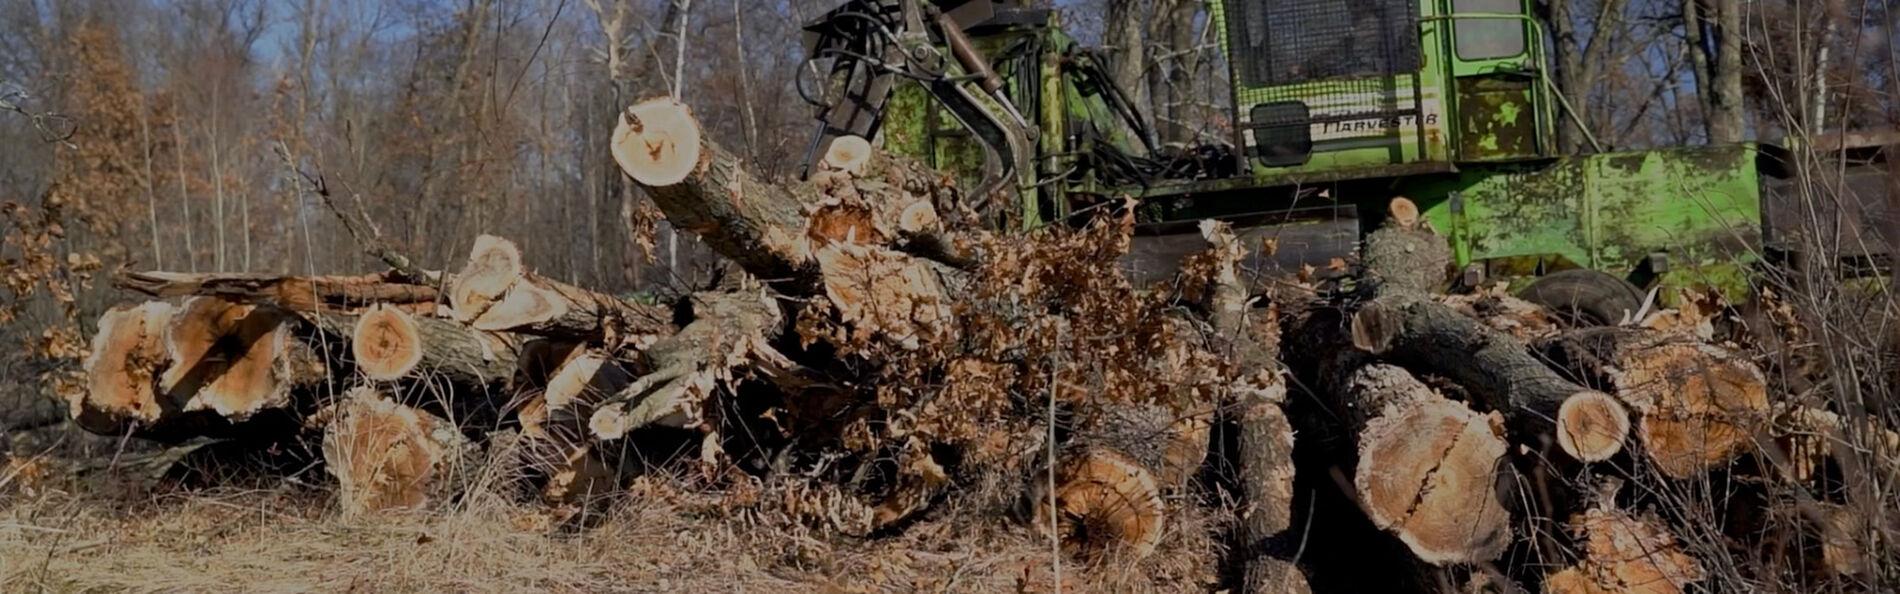 green harvester picking up cut tree trucks